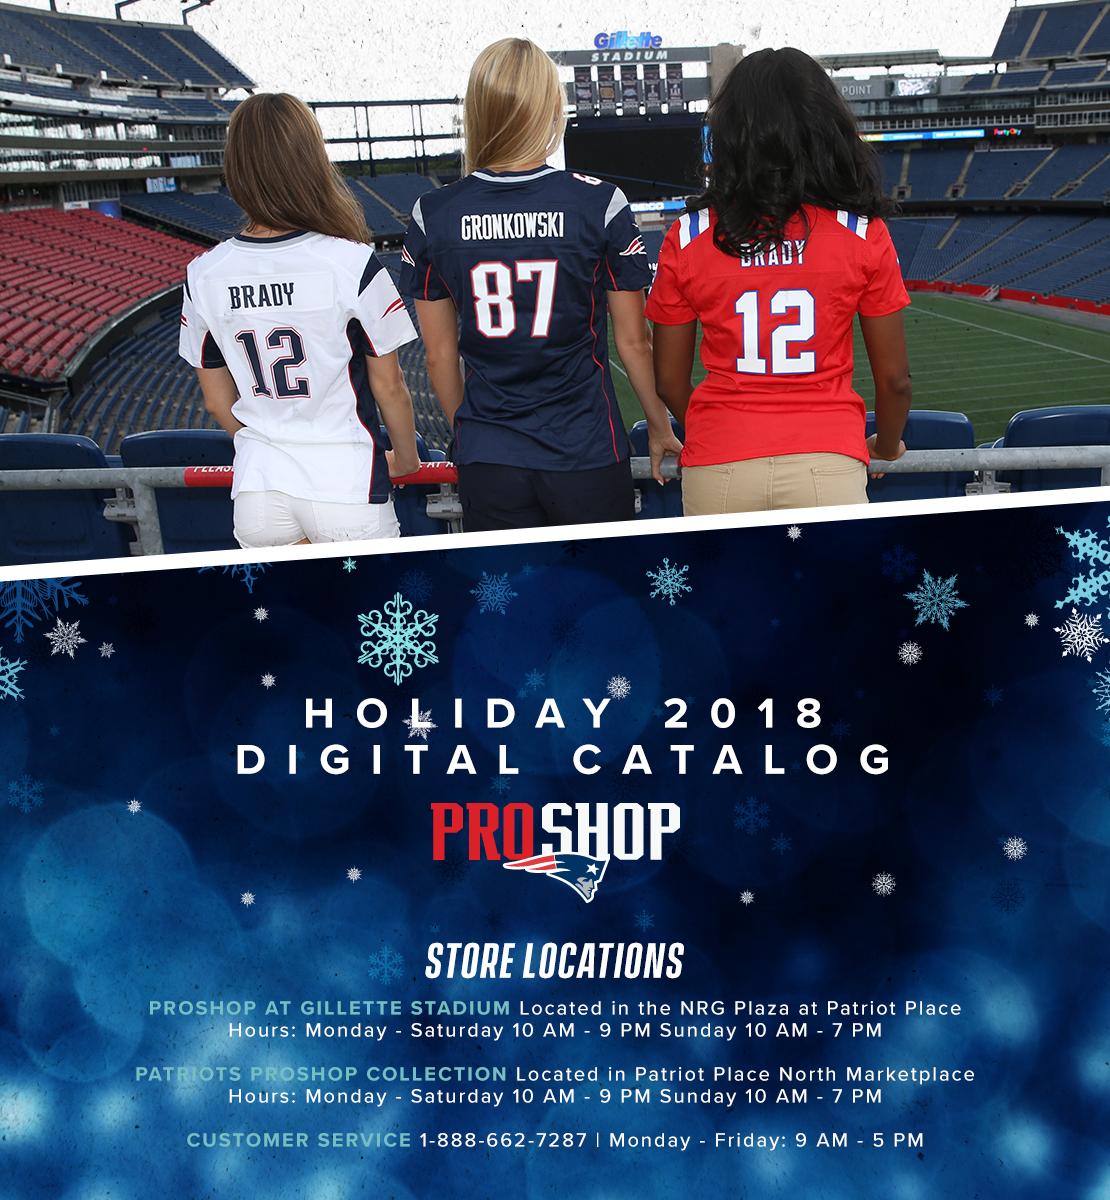 ProShop 2018 Holiday Digital Catalog